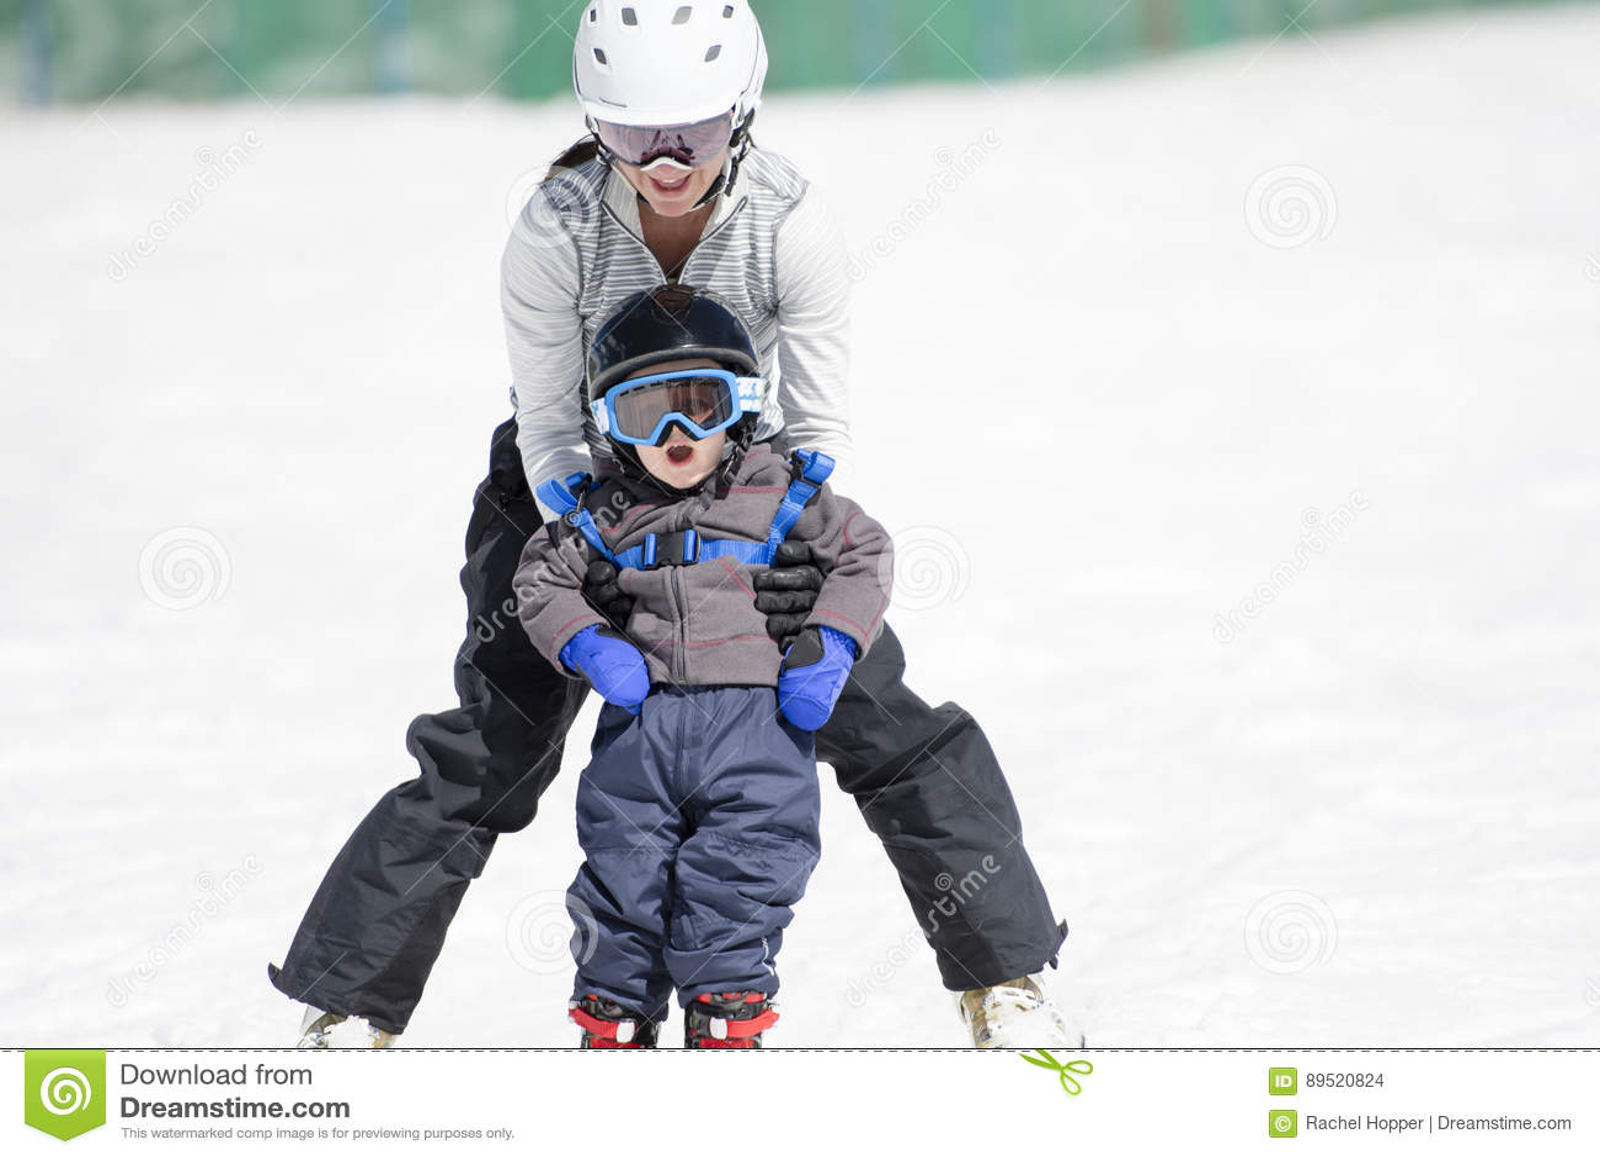 La madre ayuda al muchacho Ski Downhill de Tpoddler Vestido con seguridad